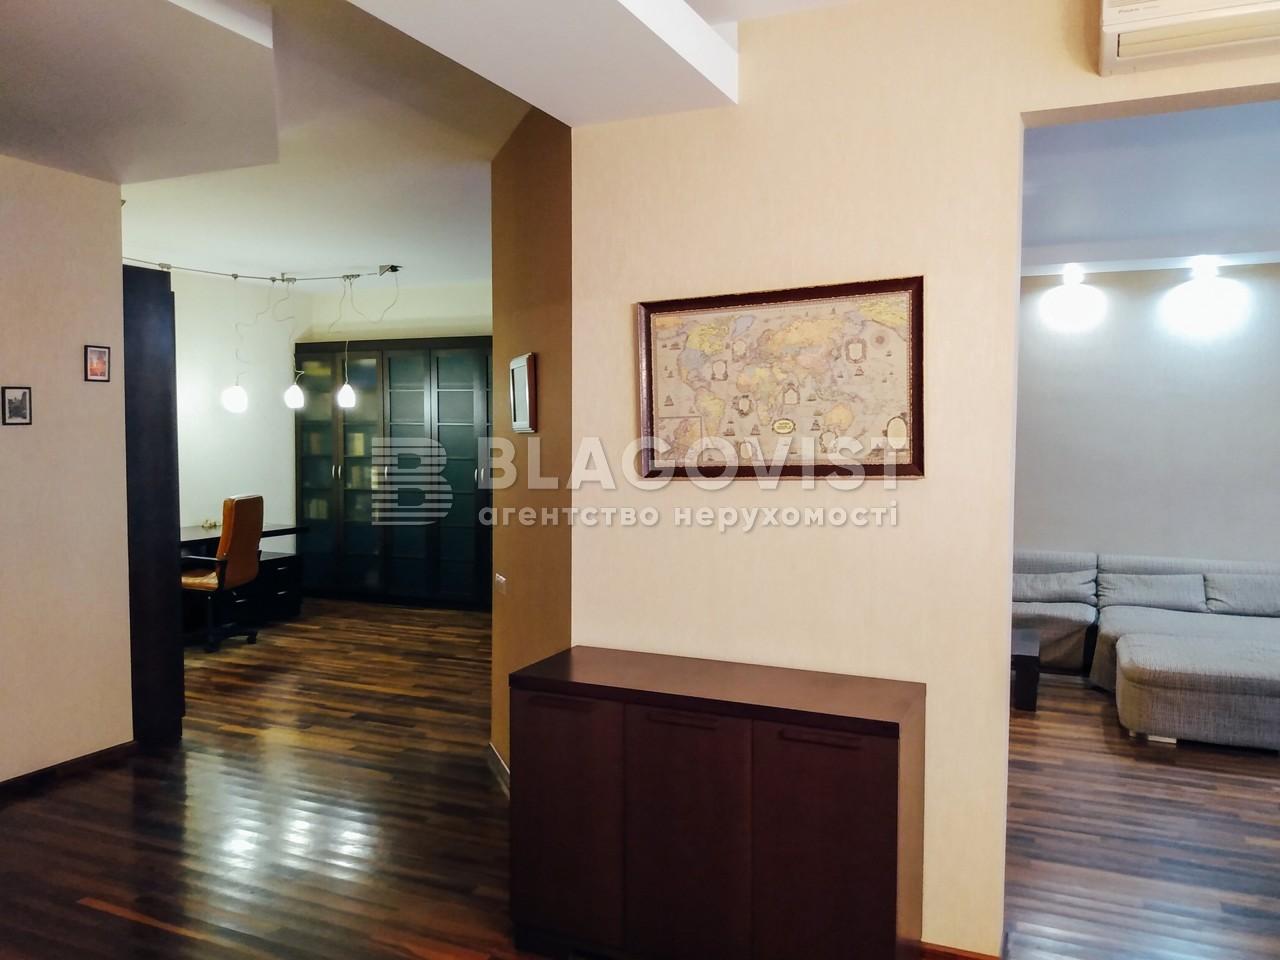 Квартира H-31785, Павлівська, 17, Київ - Фото 59